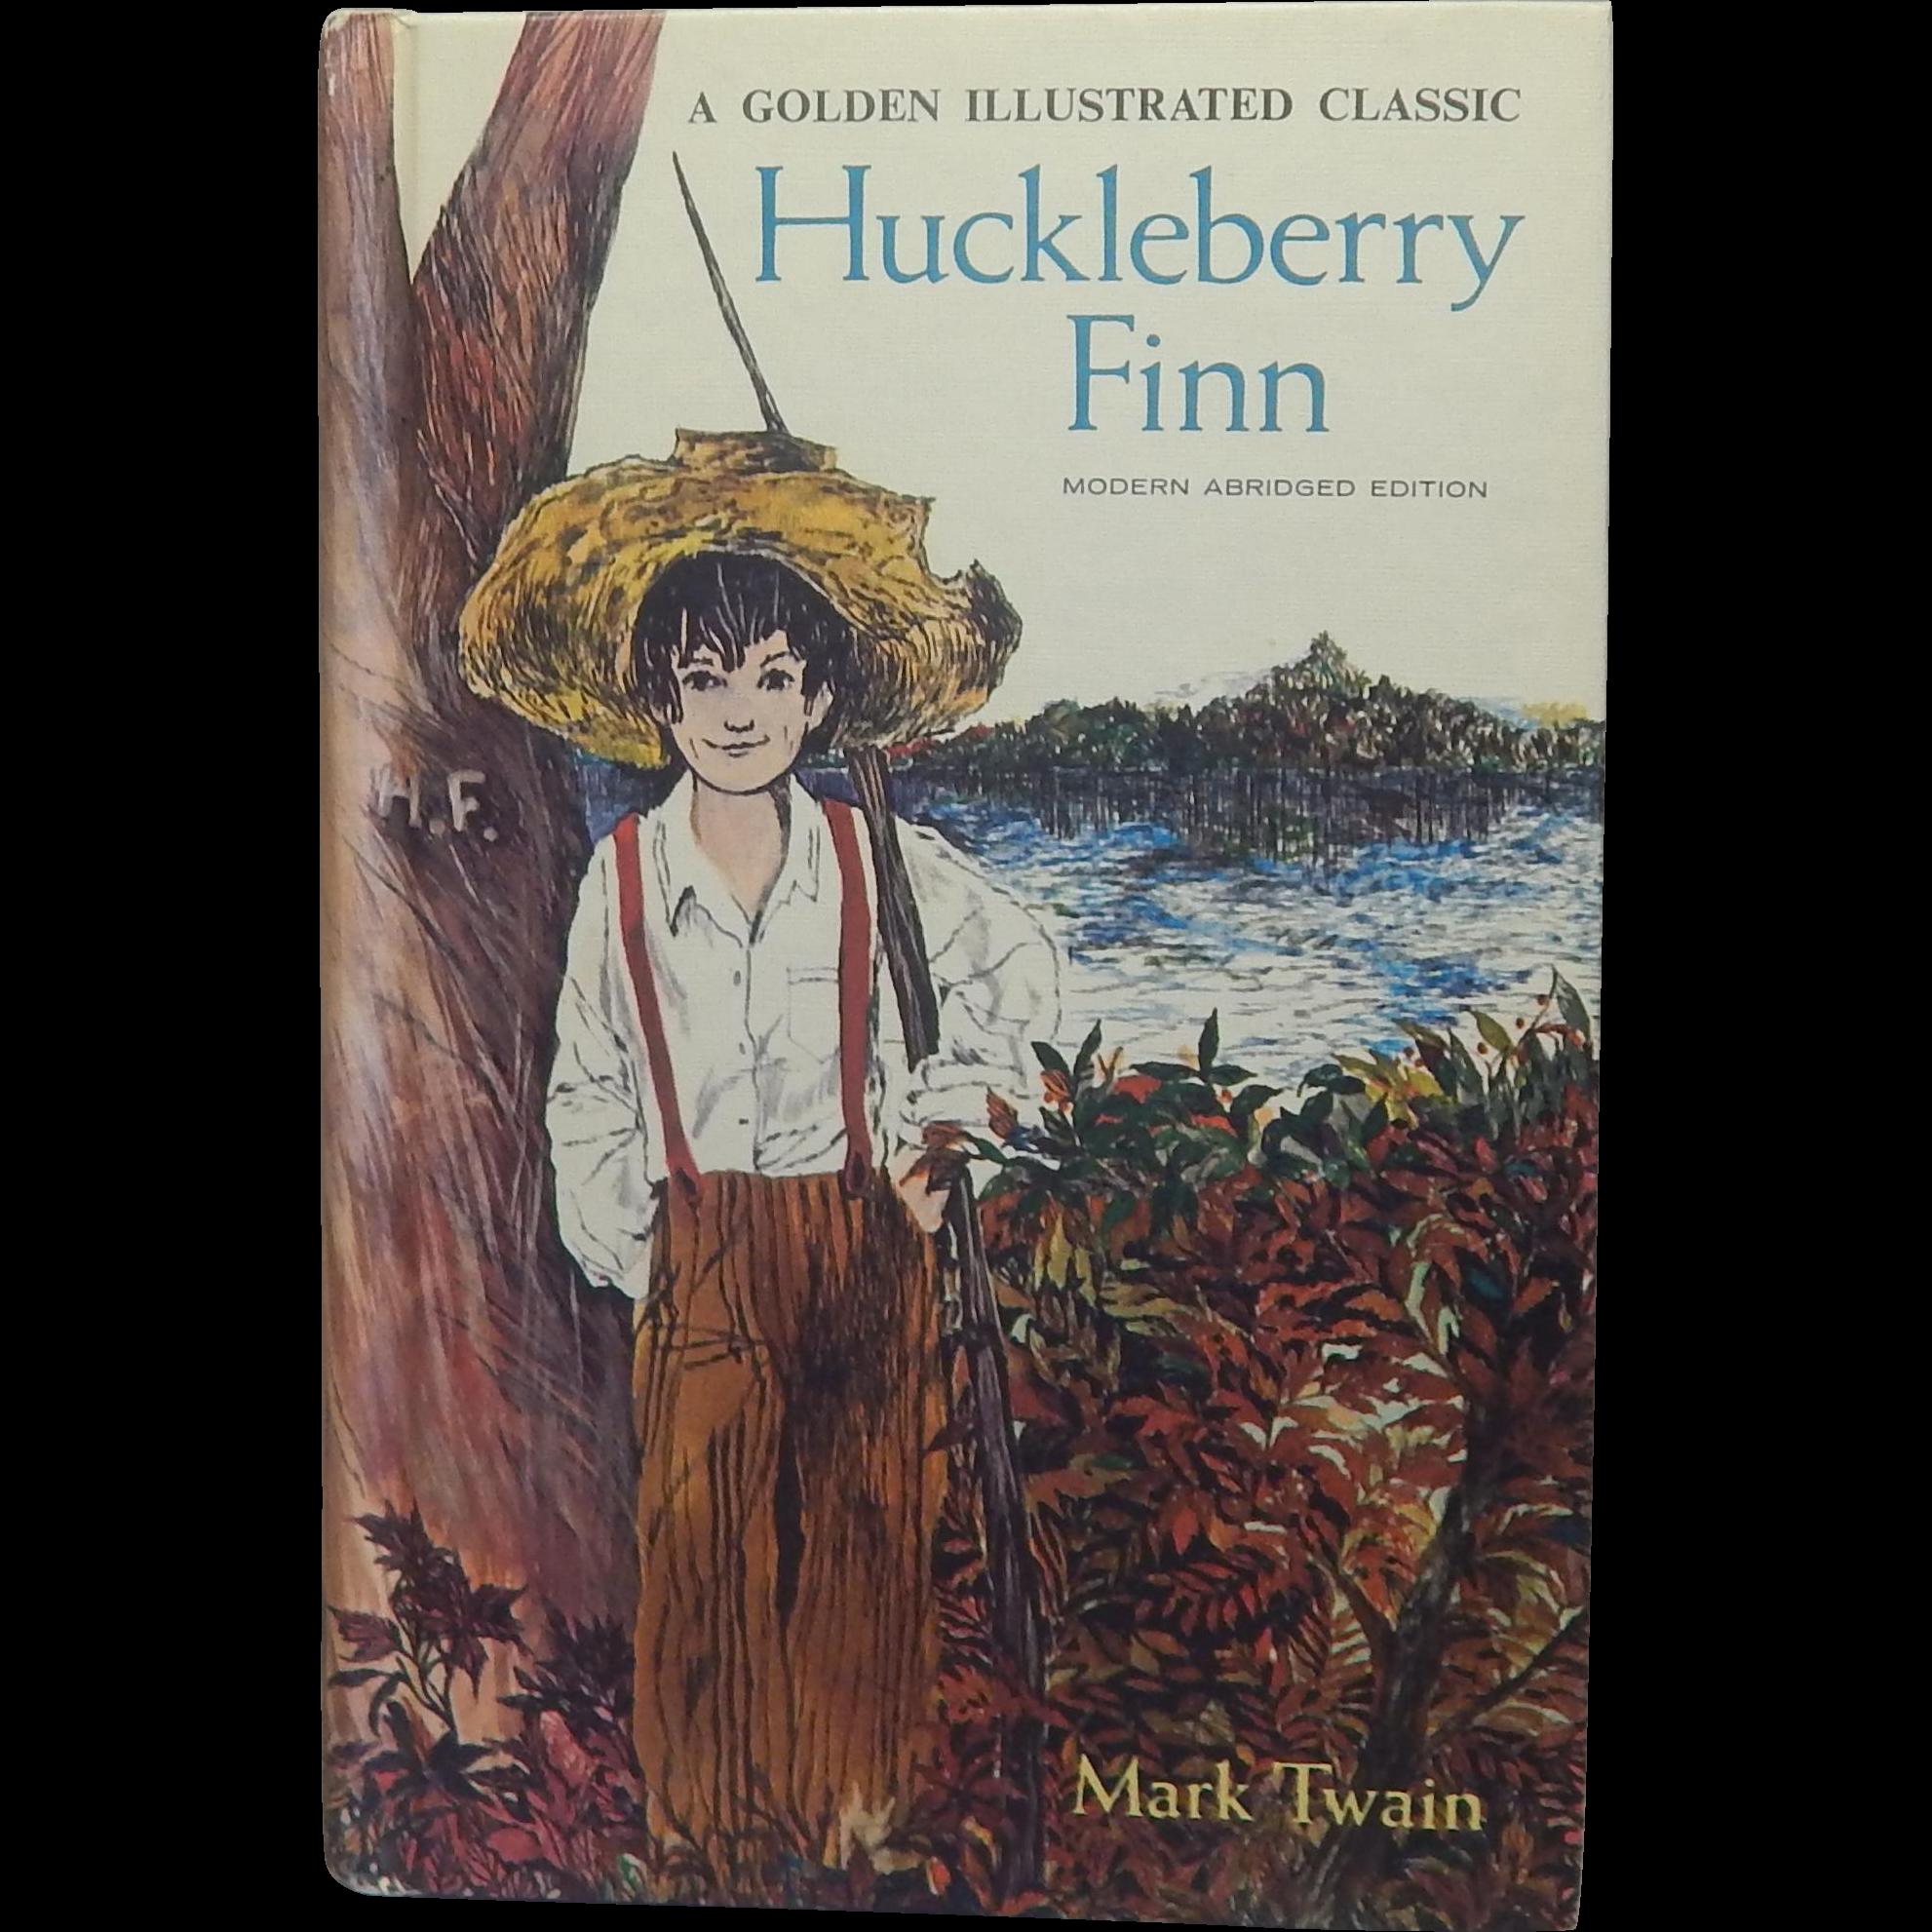 A Golden Illustrated Classic Huckleberry Finn